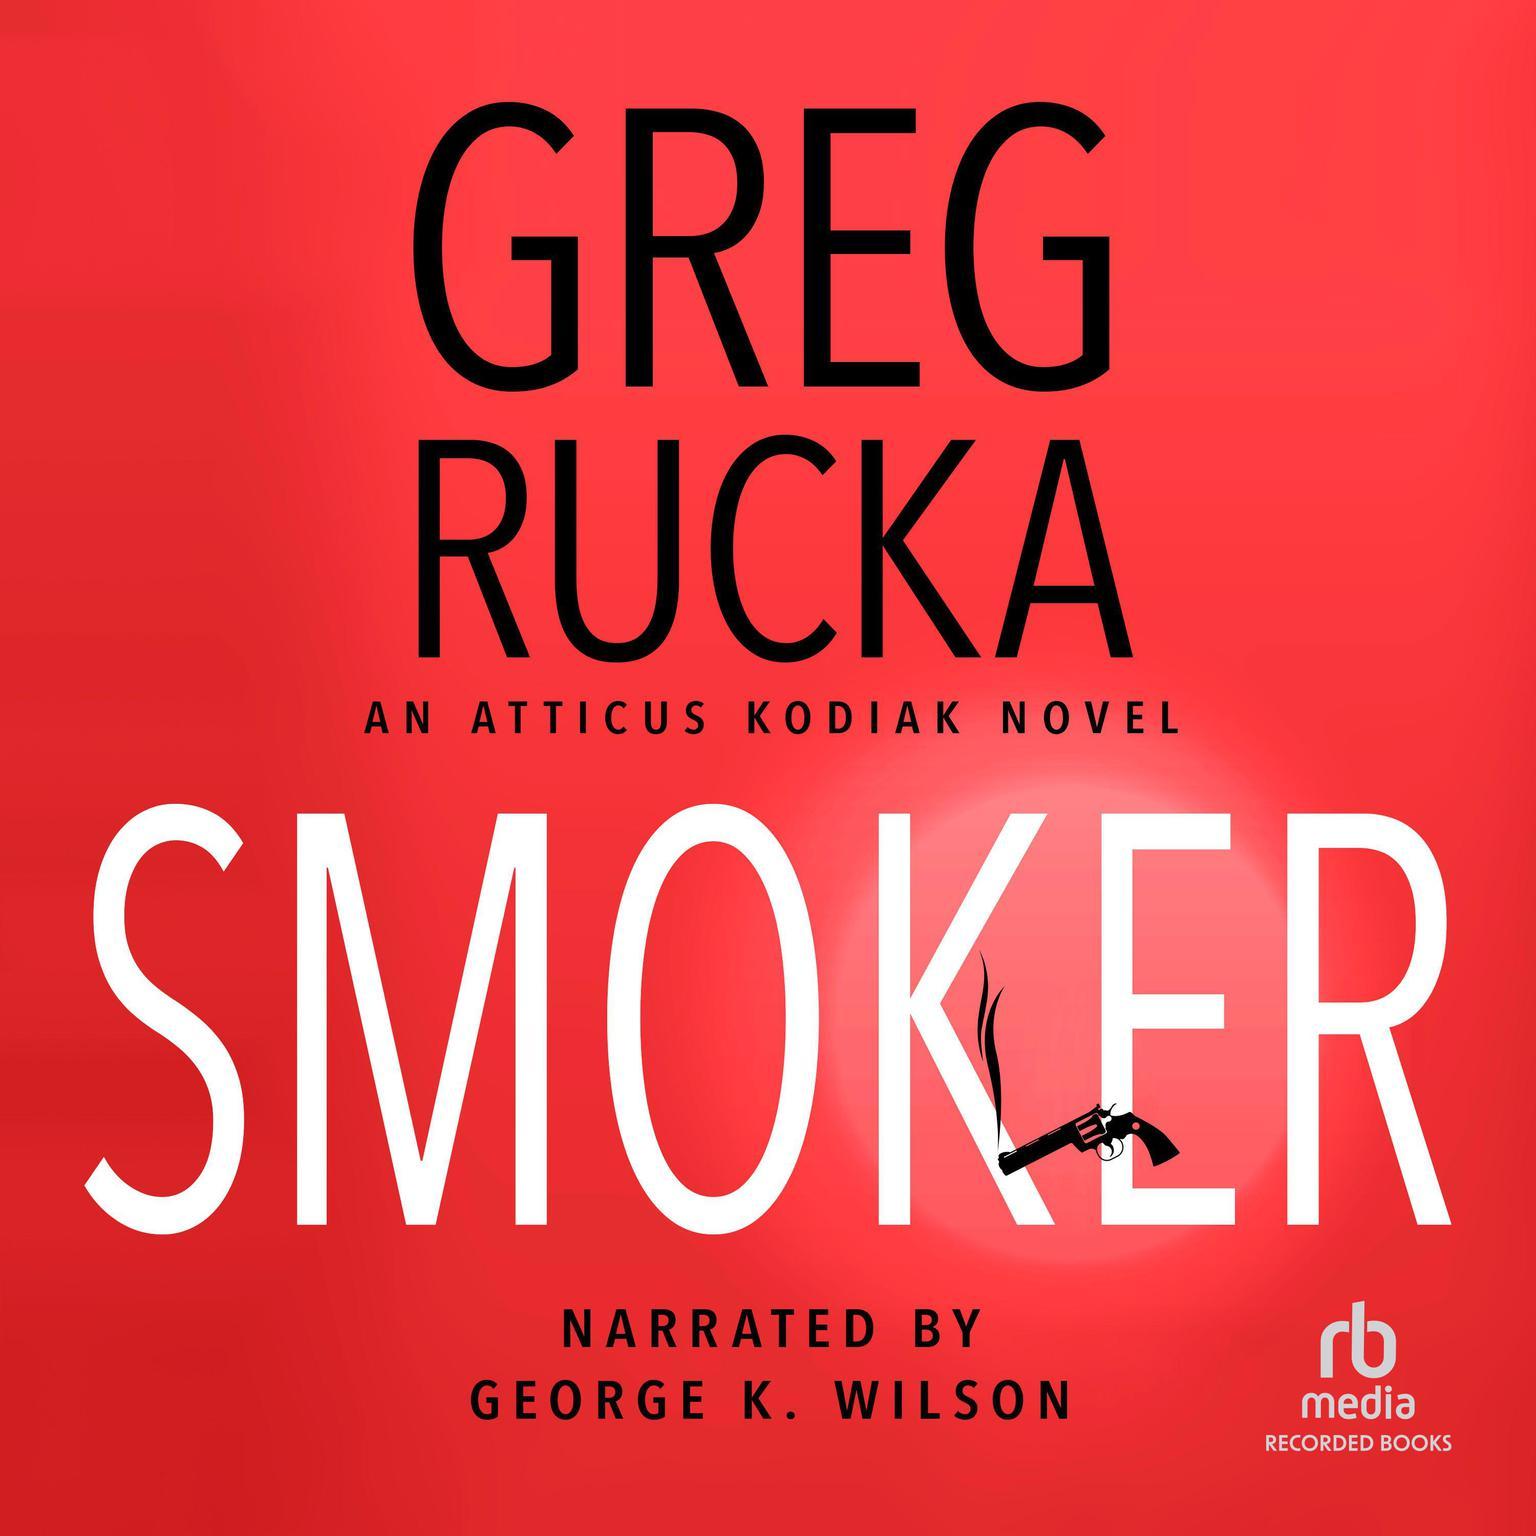 Smoker Audiobook, by Greg Rucka